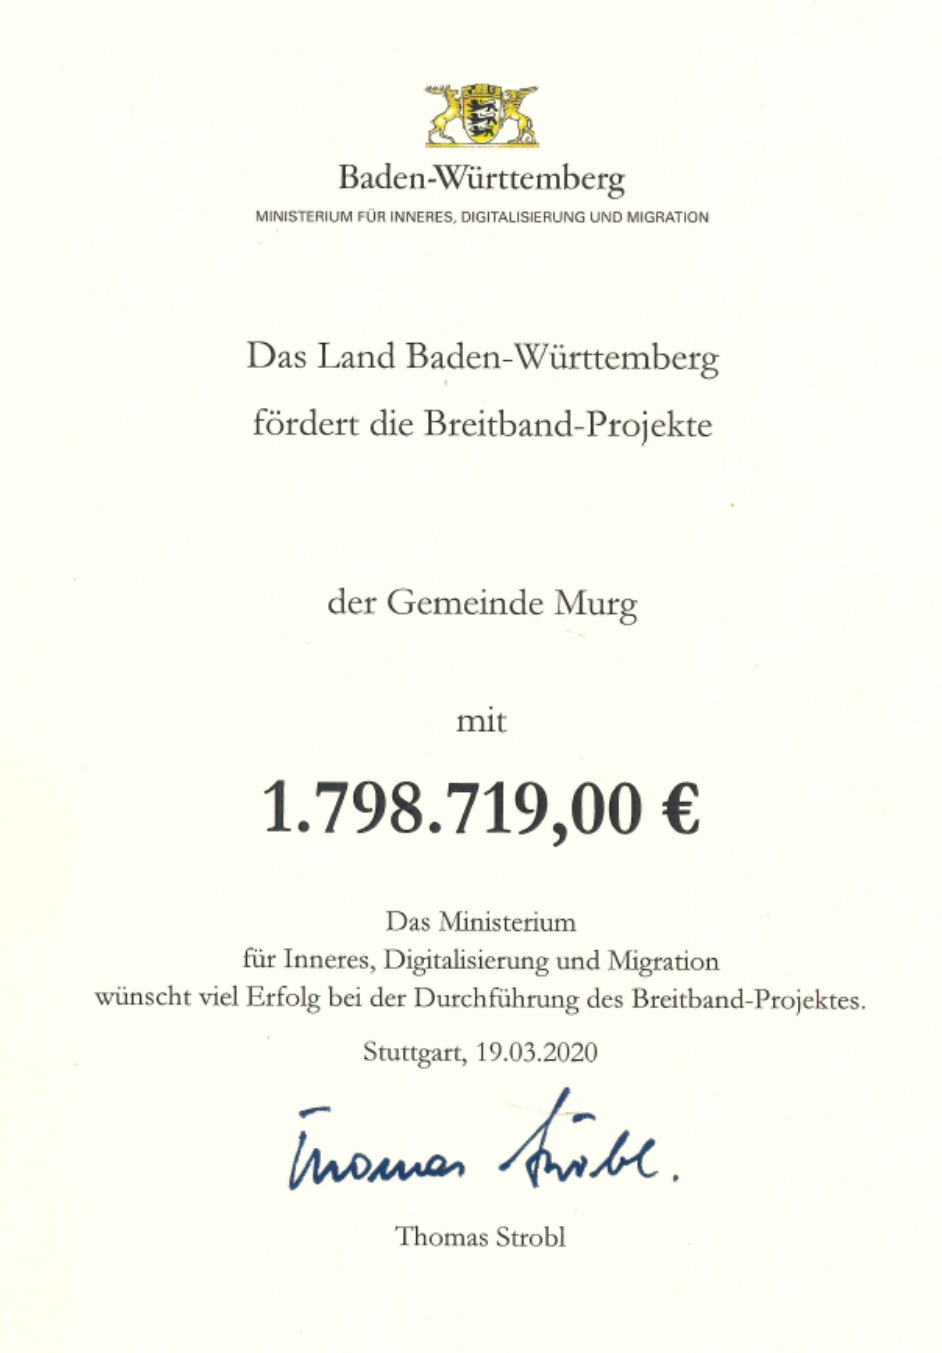 Urkunde Förderbetrag Breitband